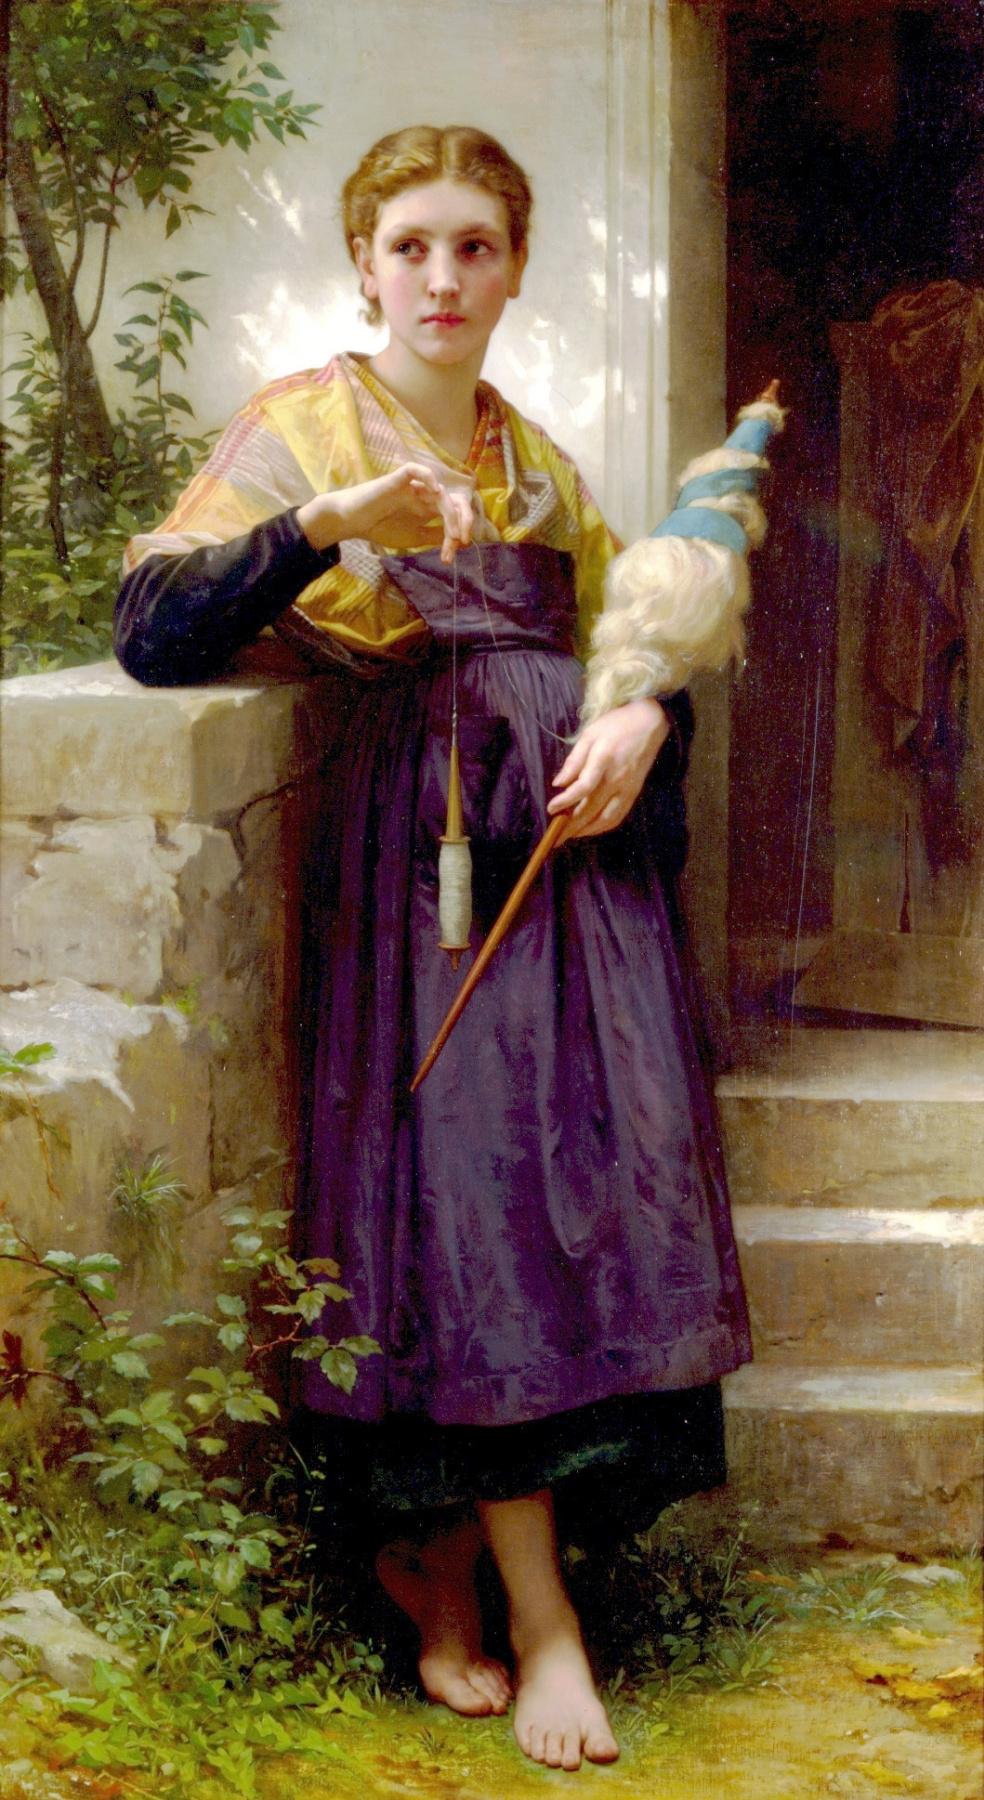 William-Adolphe Bouguereau. Spinner